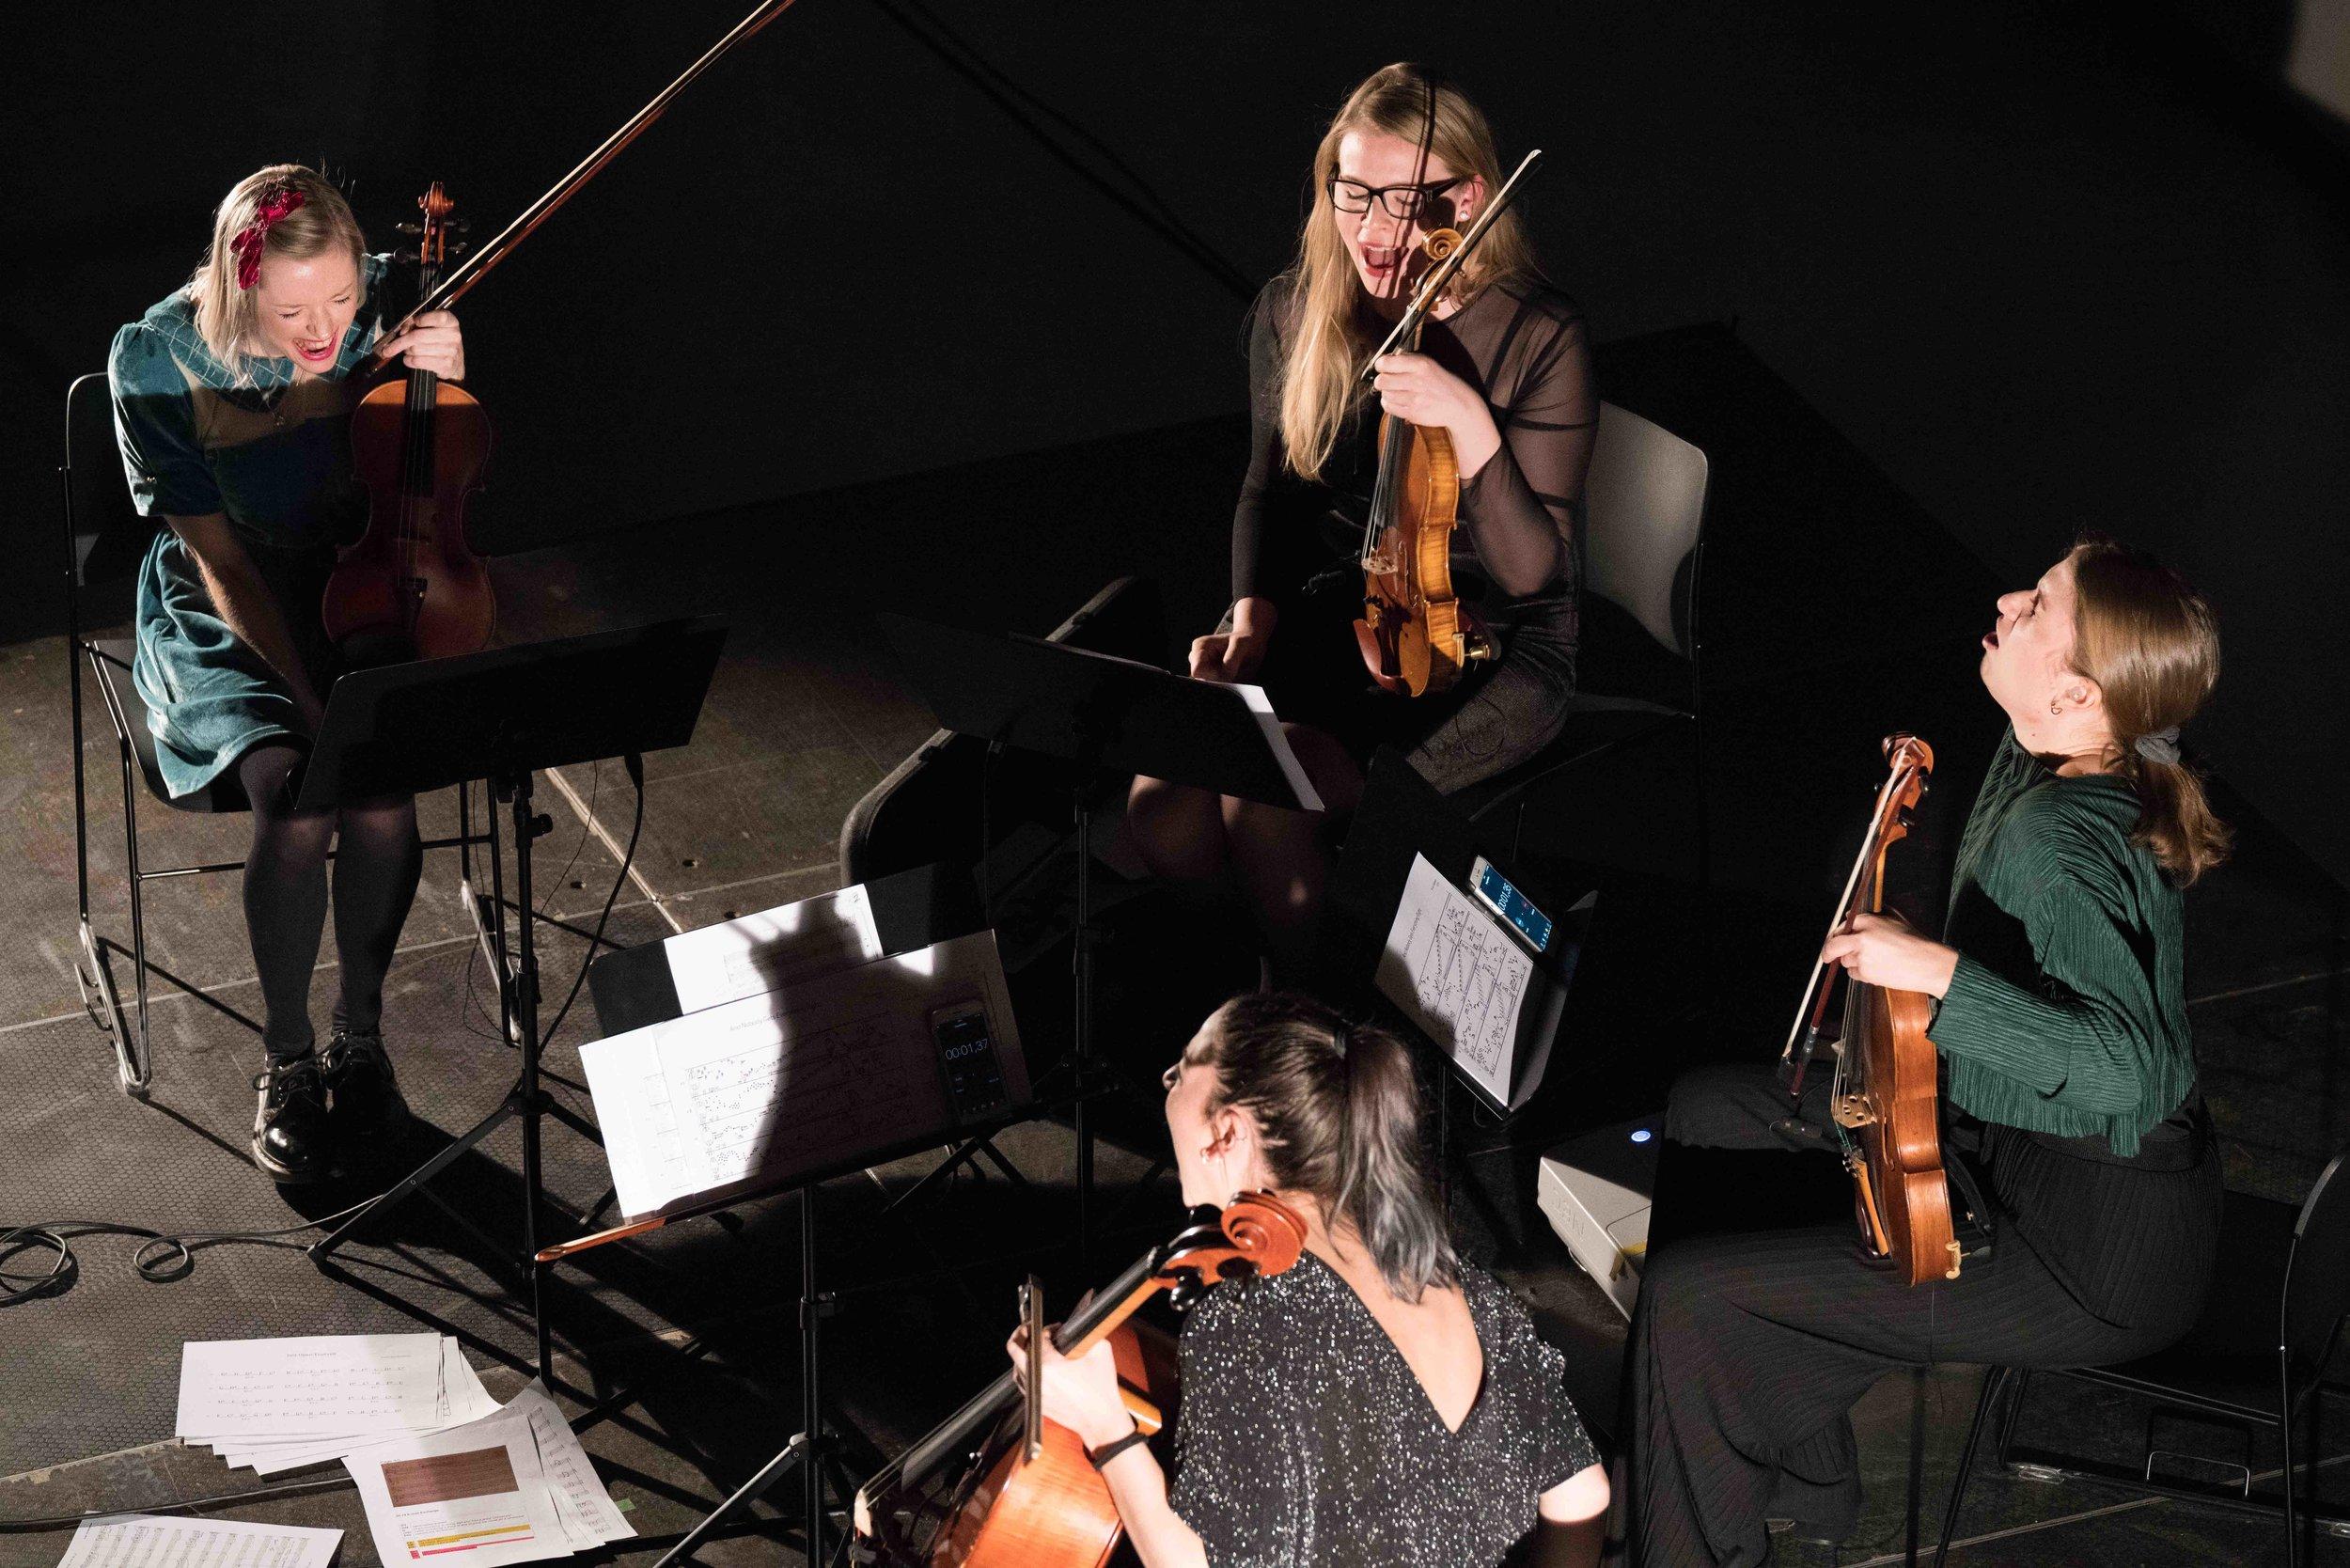 Rosella/Borealis Ung Komponist 2017/2018.Foto: Thor Brødreskift/Borealis